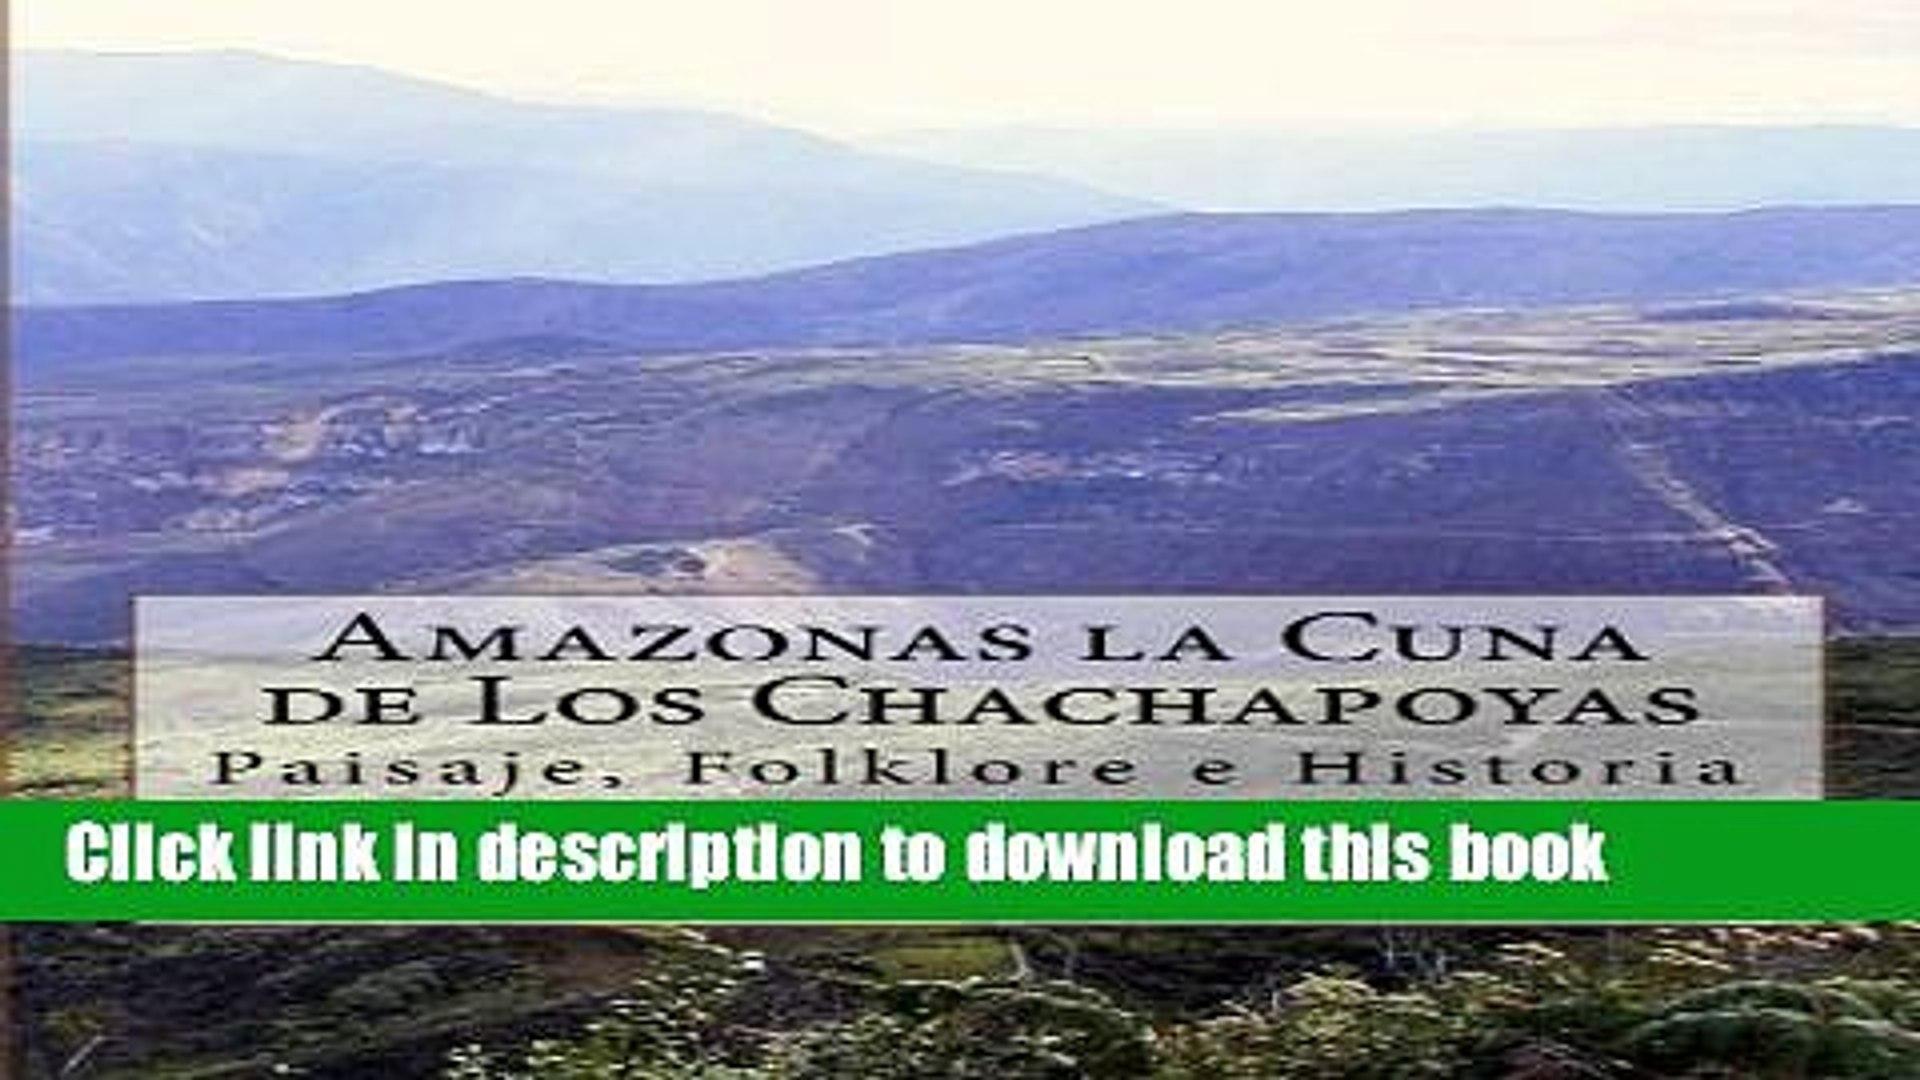 Read Books Amazonas la Cuna de Los Chachapoyas: Paisaje, Folklore e Historia (Spanish Edition)